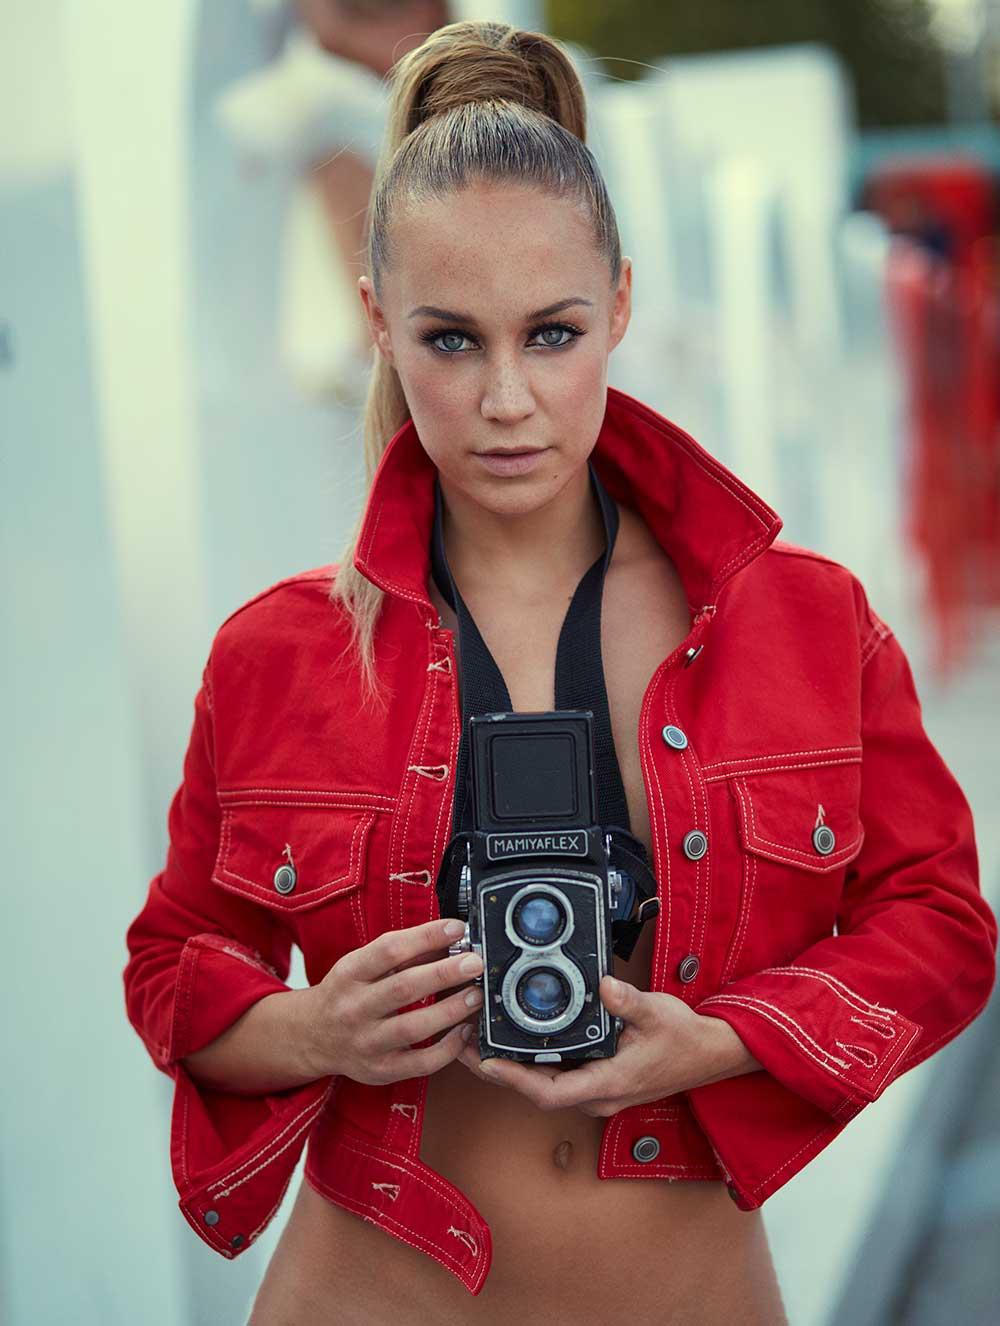 Alle sexy foto's van Anouk Maas uit JFK